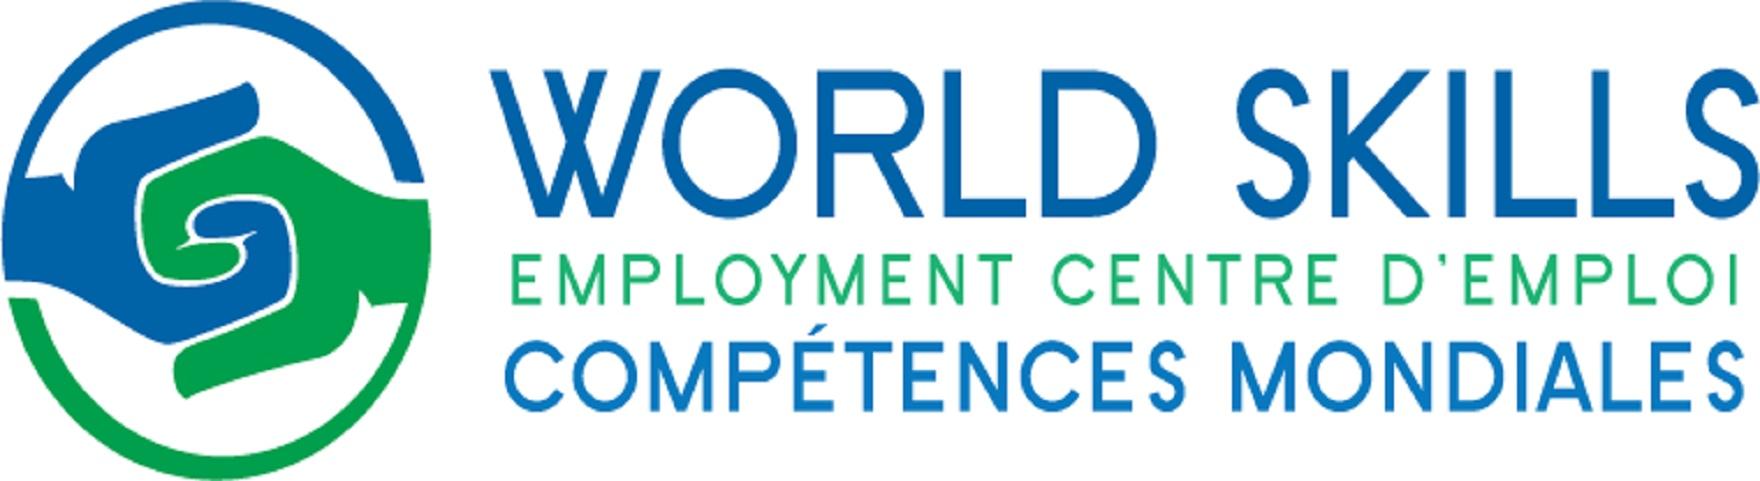 World-Skills-Logo_L.jpg